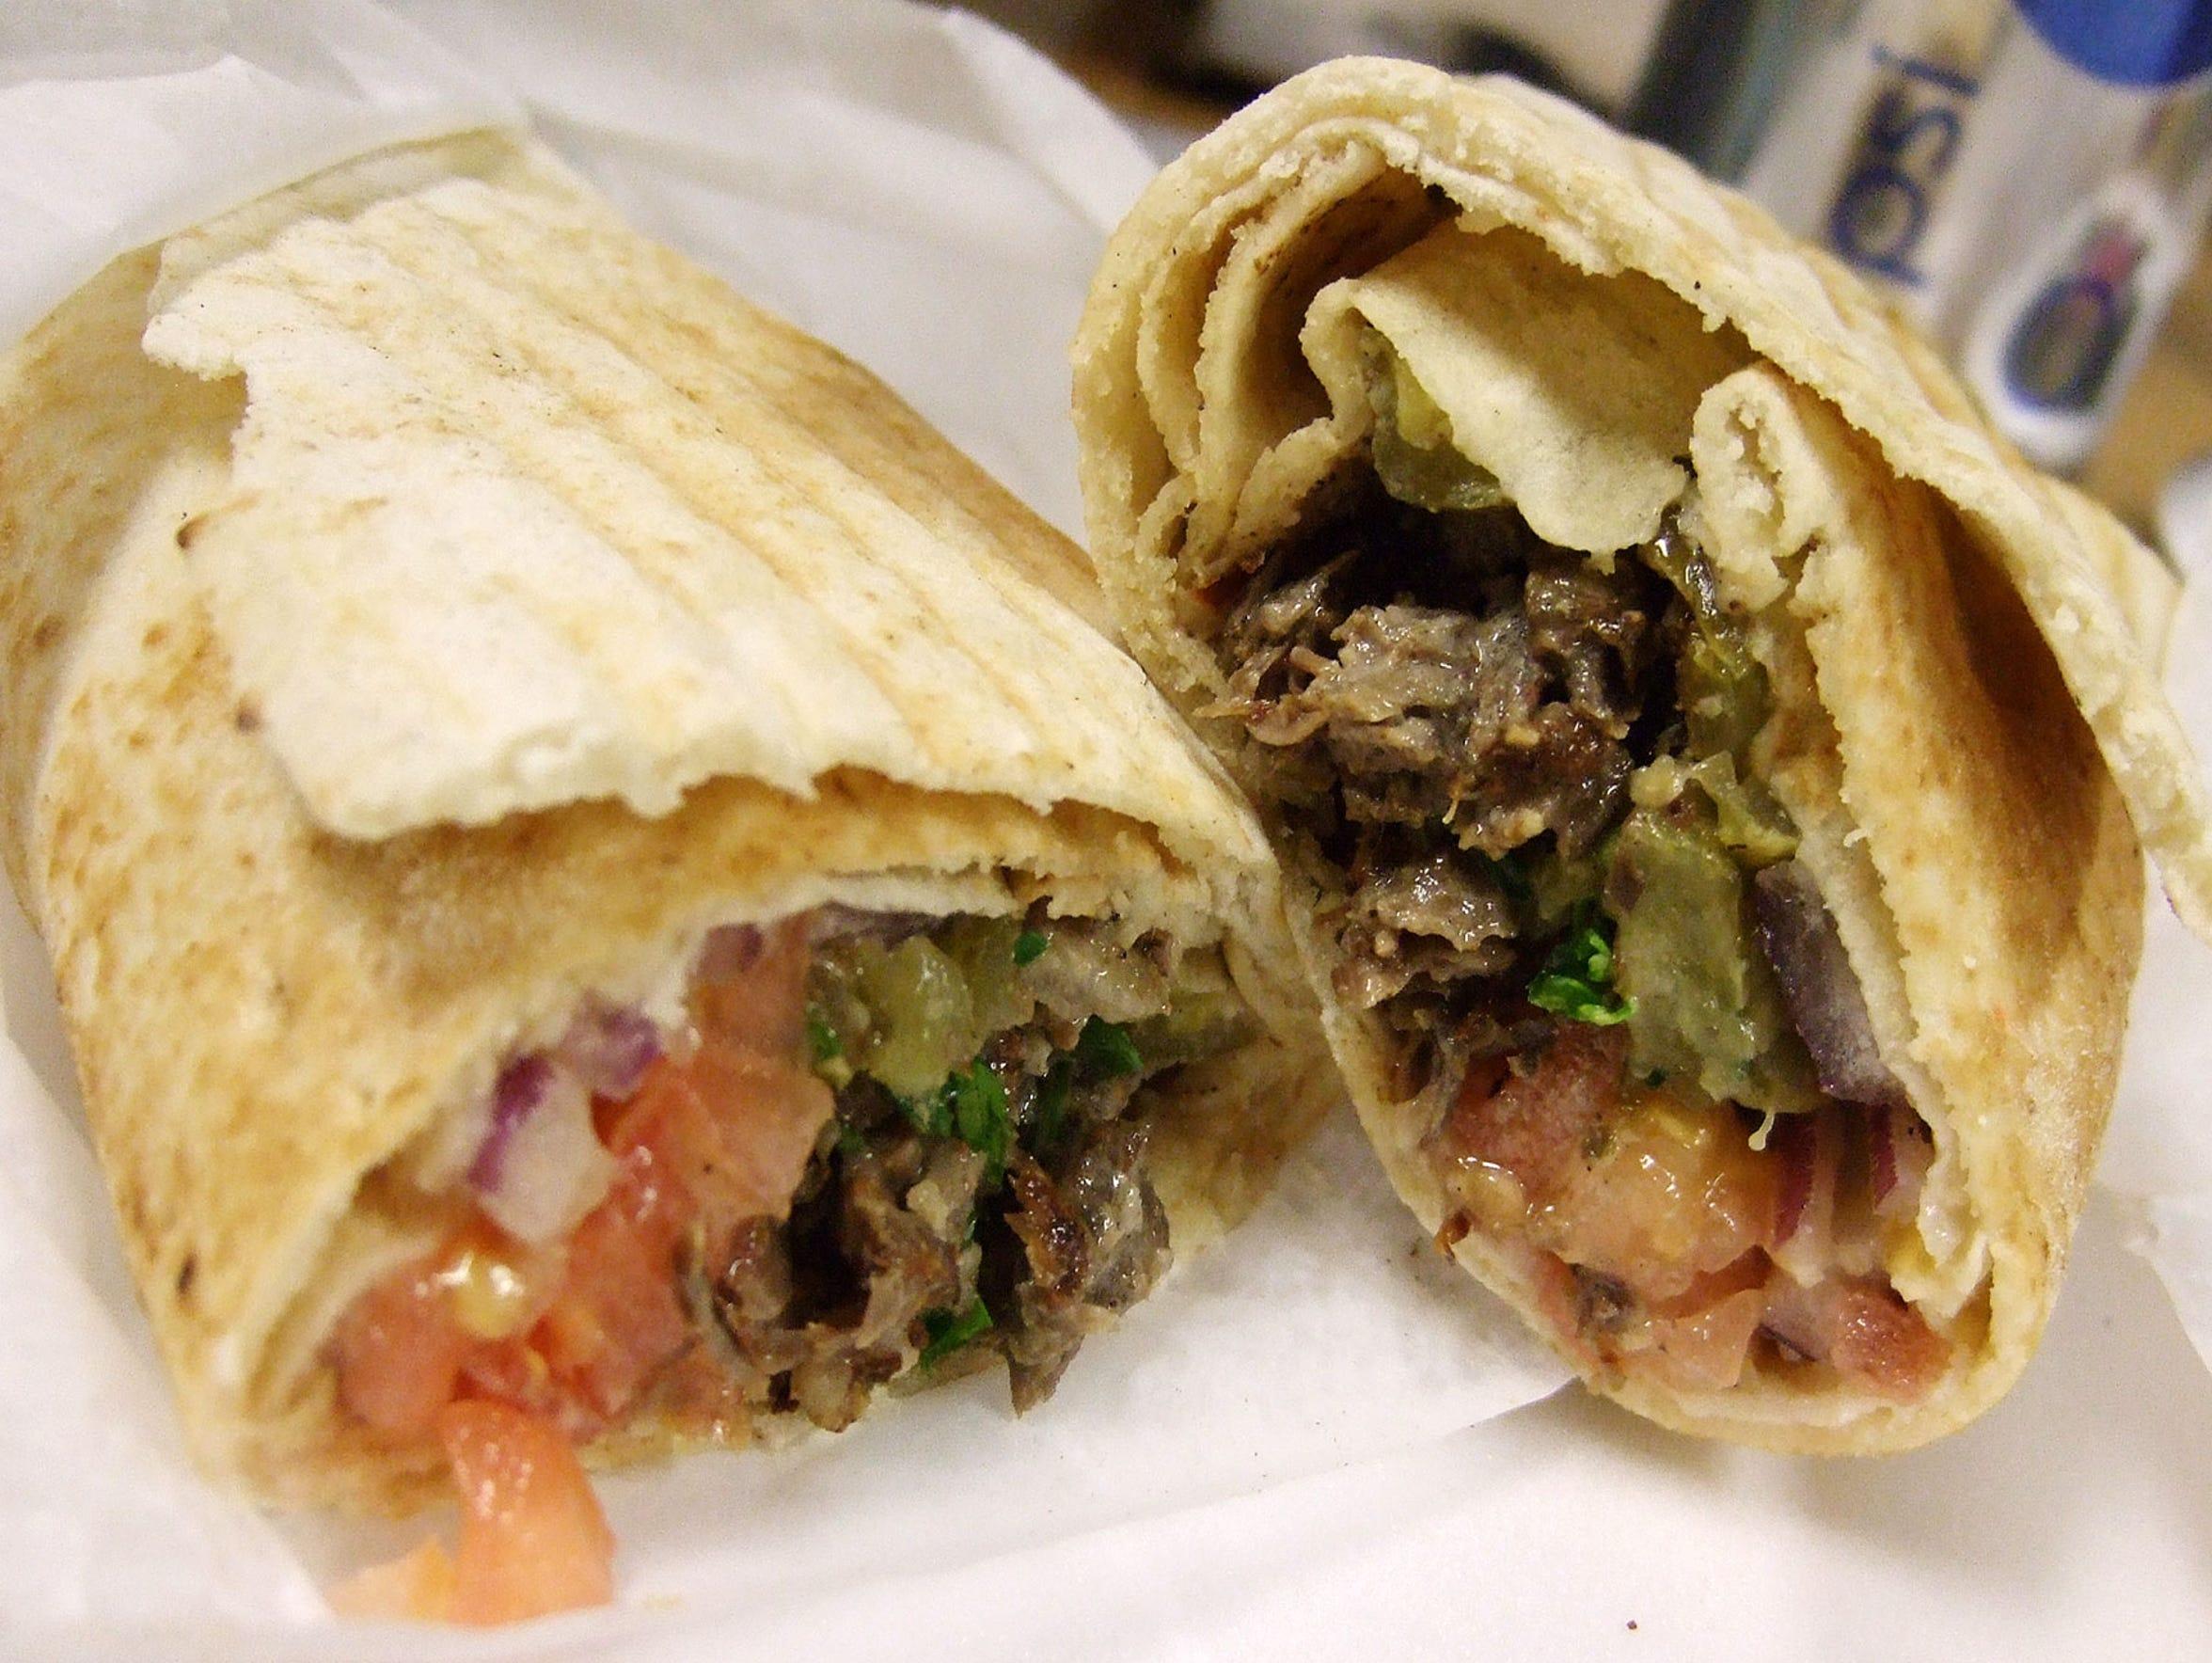 The beef shawarma sandwich at Al-Hana Restaurant in Phoenix.